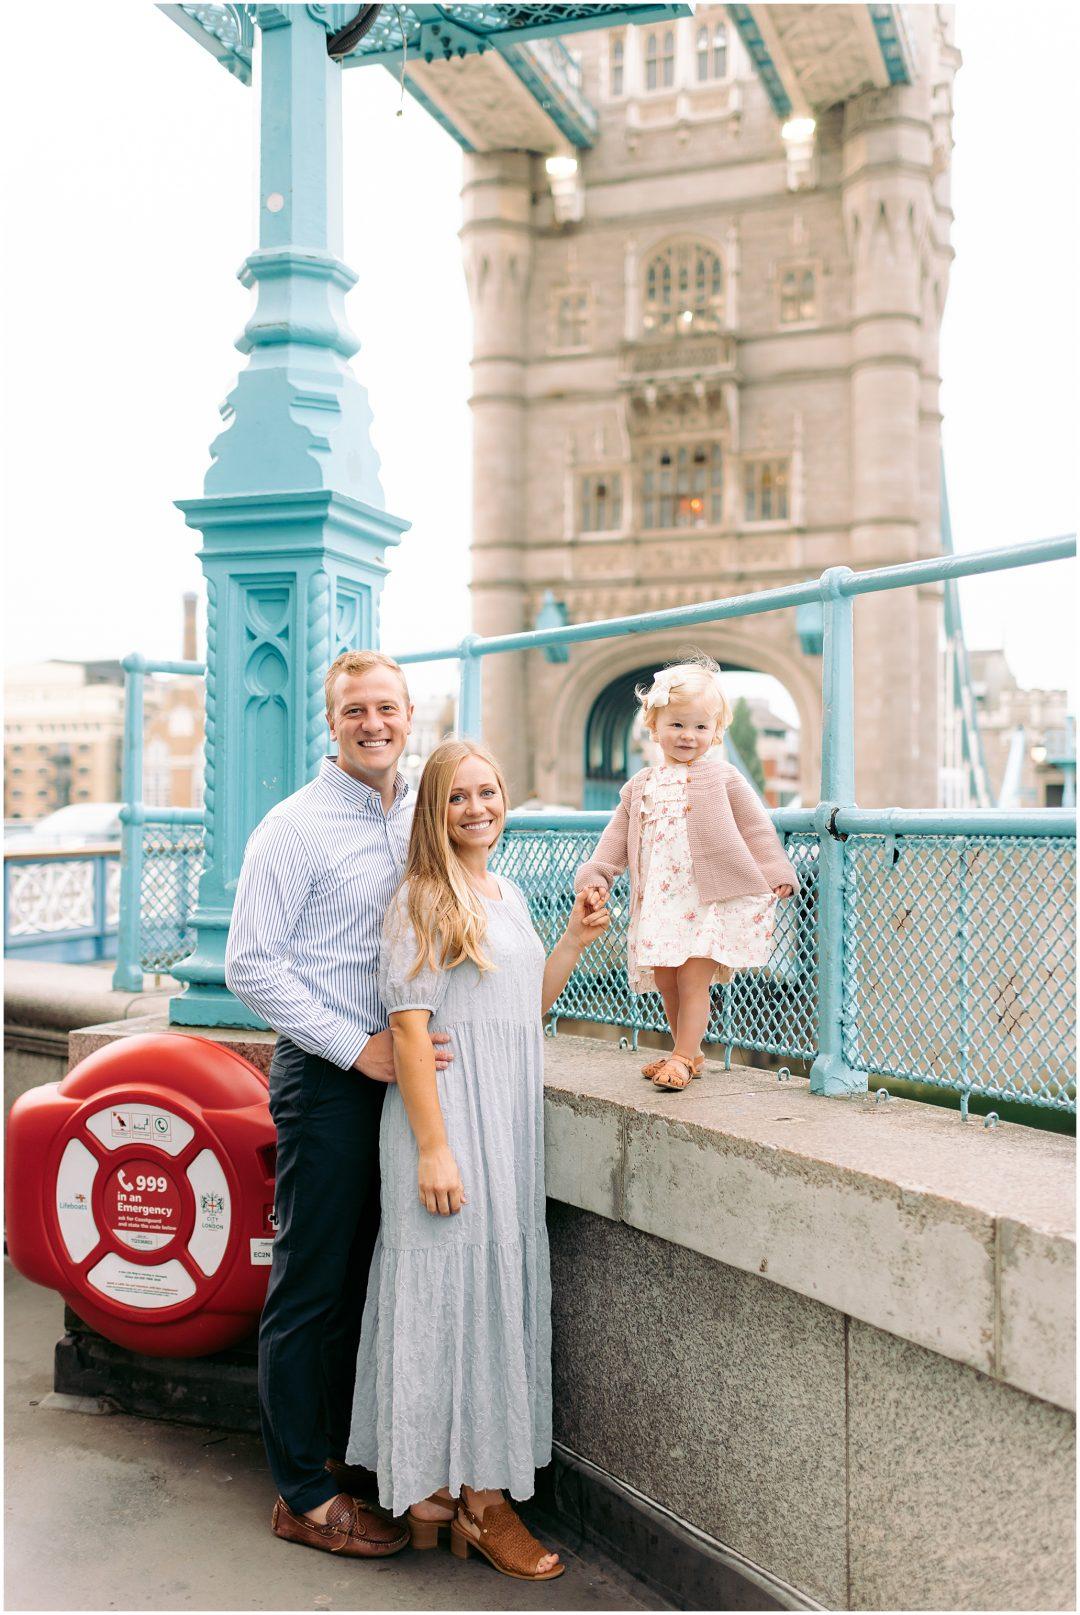 London family photographer, Tower Bridge - family - London family photographer Tower Bridge family shoot Nkimaphotography 0012